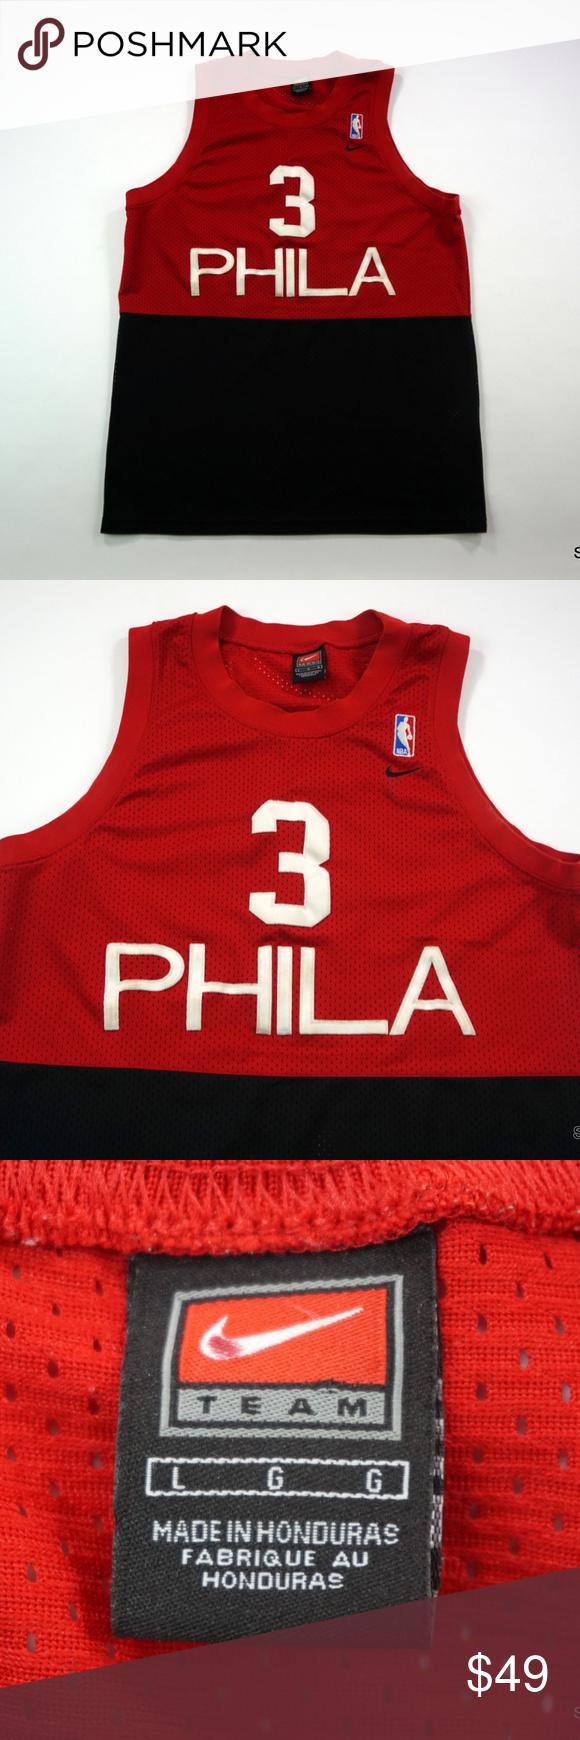 435e9b3ede4 Nike Phila Philadelphia 76ers Allen Iverson Jersey Nike Throwback Phila  Philadelphia 76ers Allen Iverson Basketball Jersey